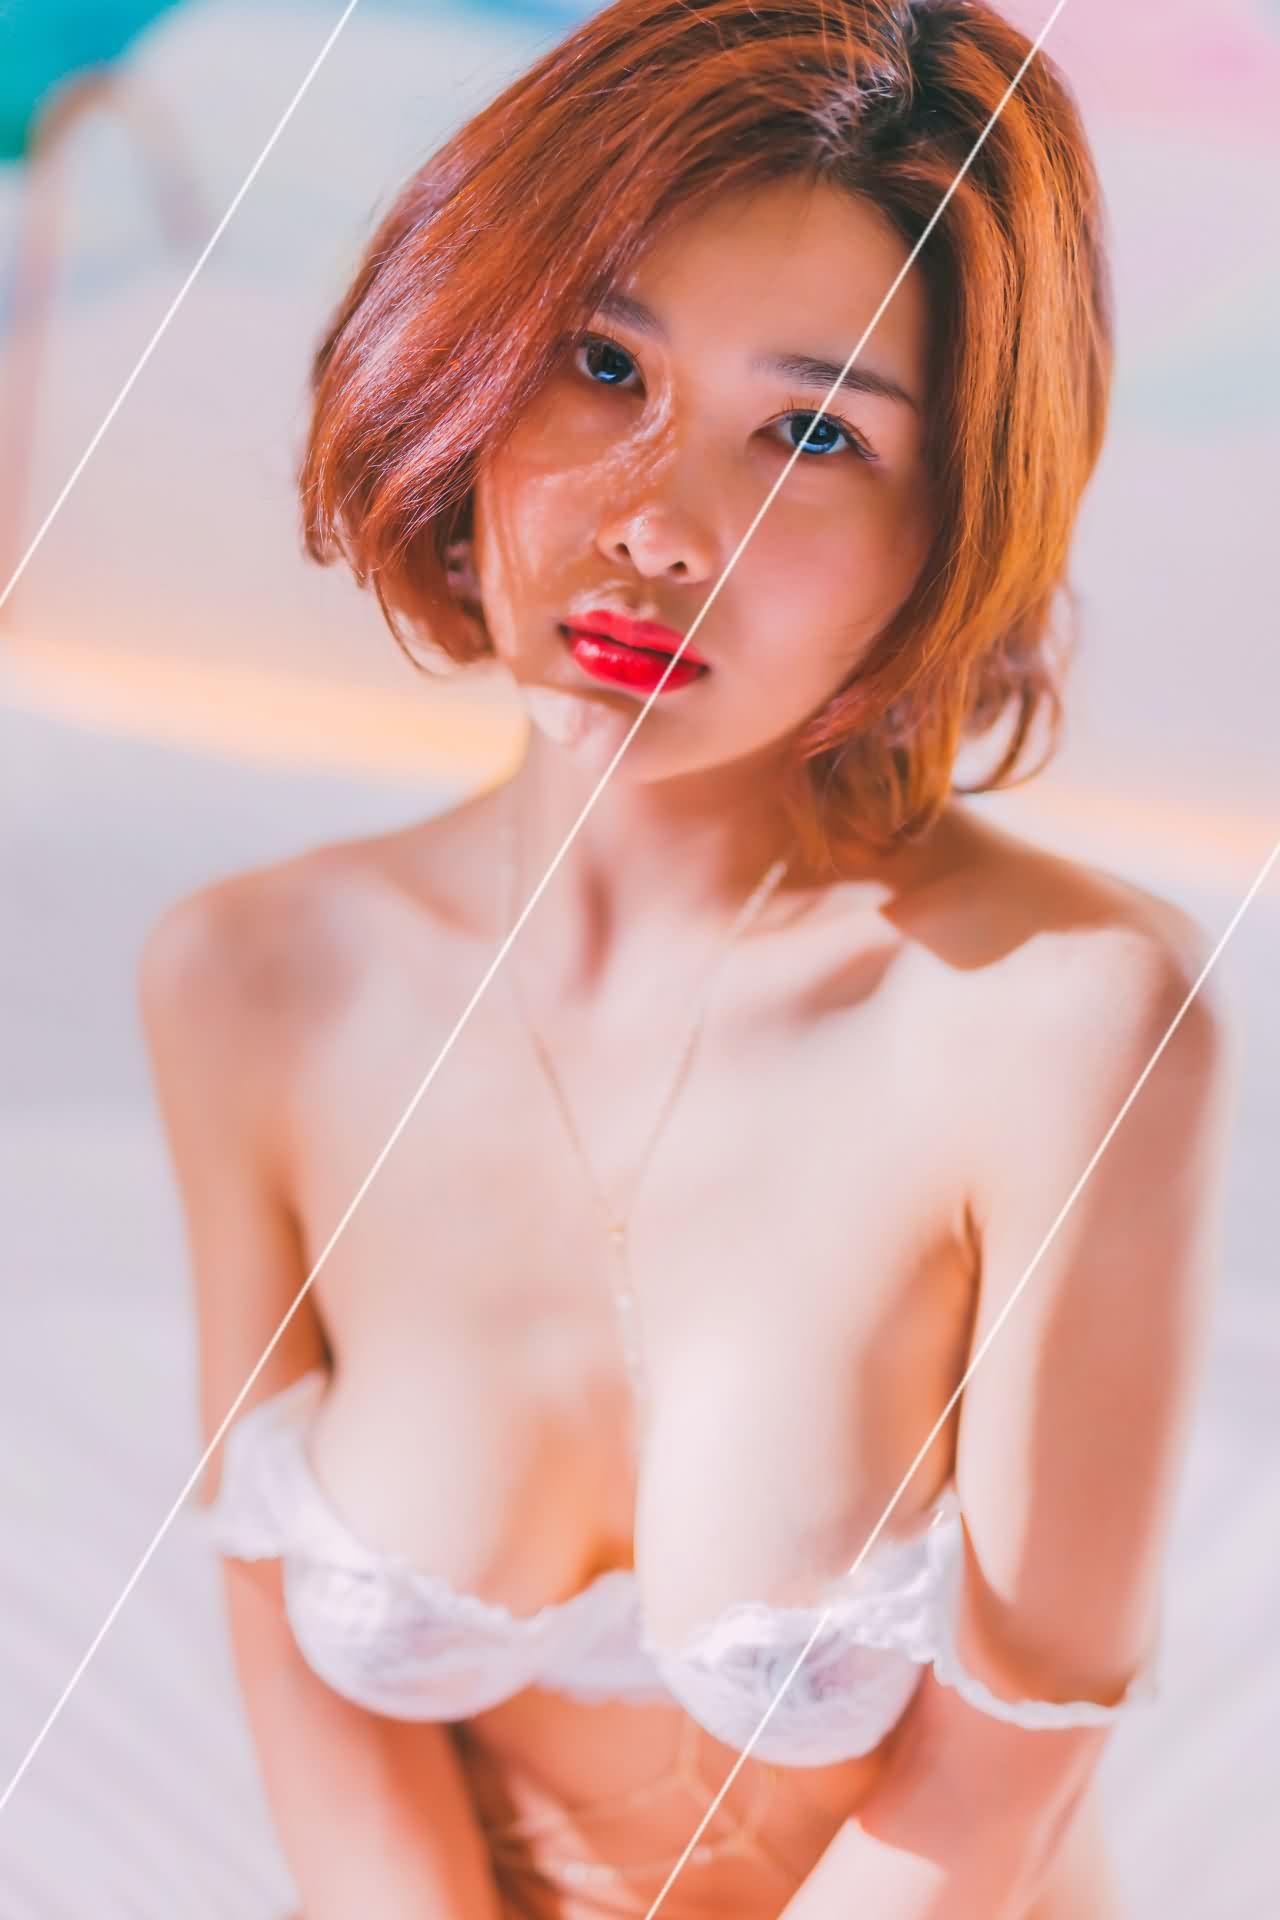 dd82c2b7bf20180803000896 - 闫盼盼7月最新写真 透视 裸心 两套[67P/50P]